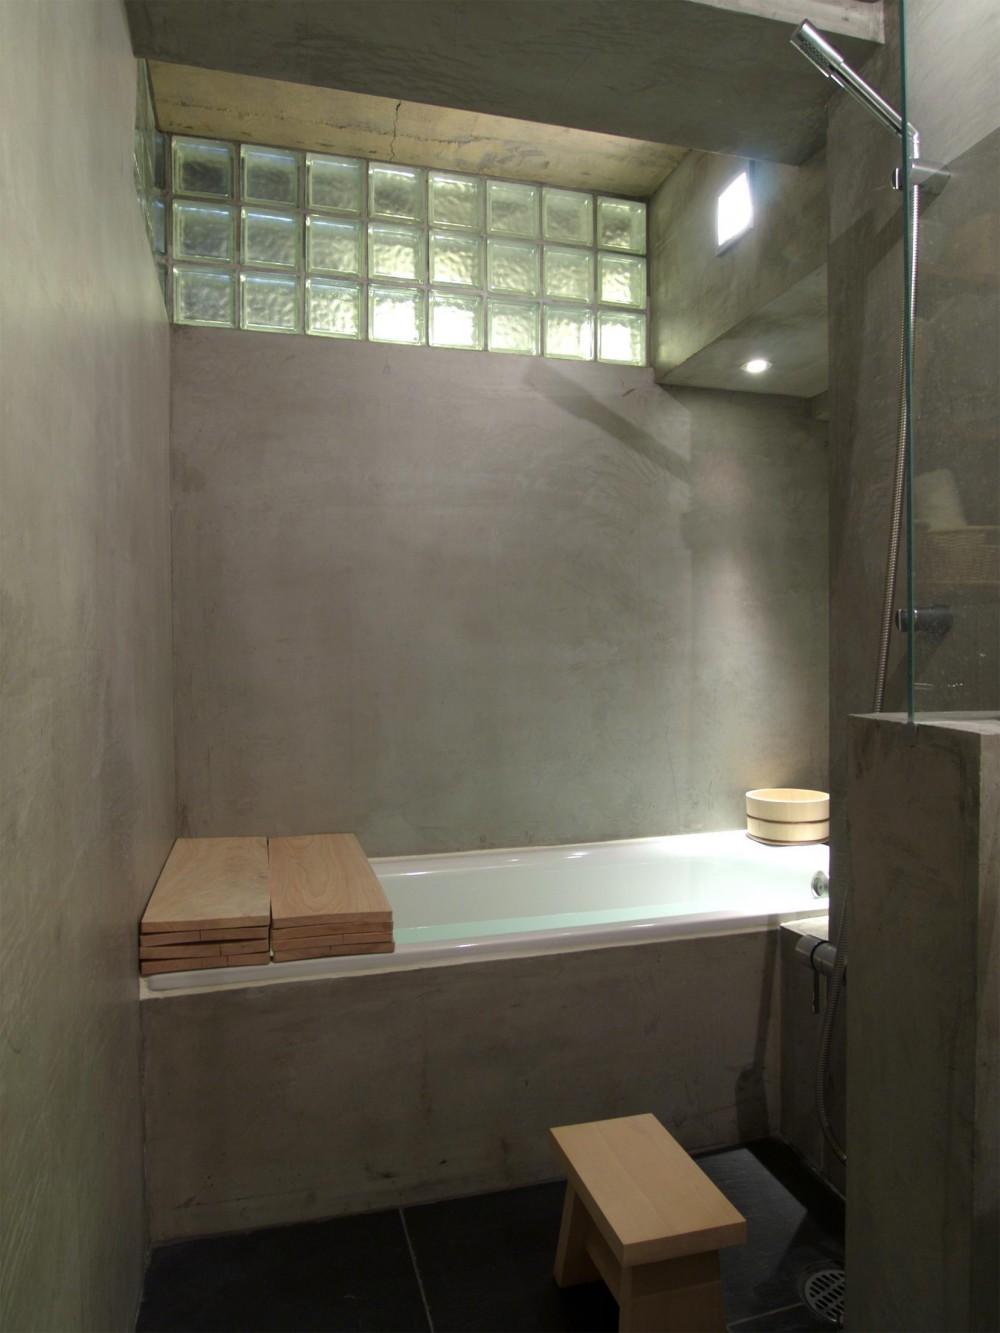 RIKUBUNー畳を生活の中心にしたリノベーション (バスルーム)